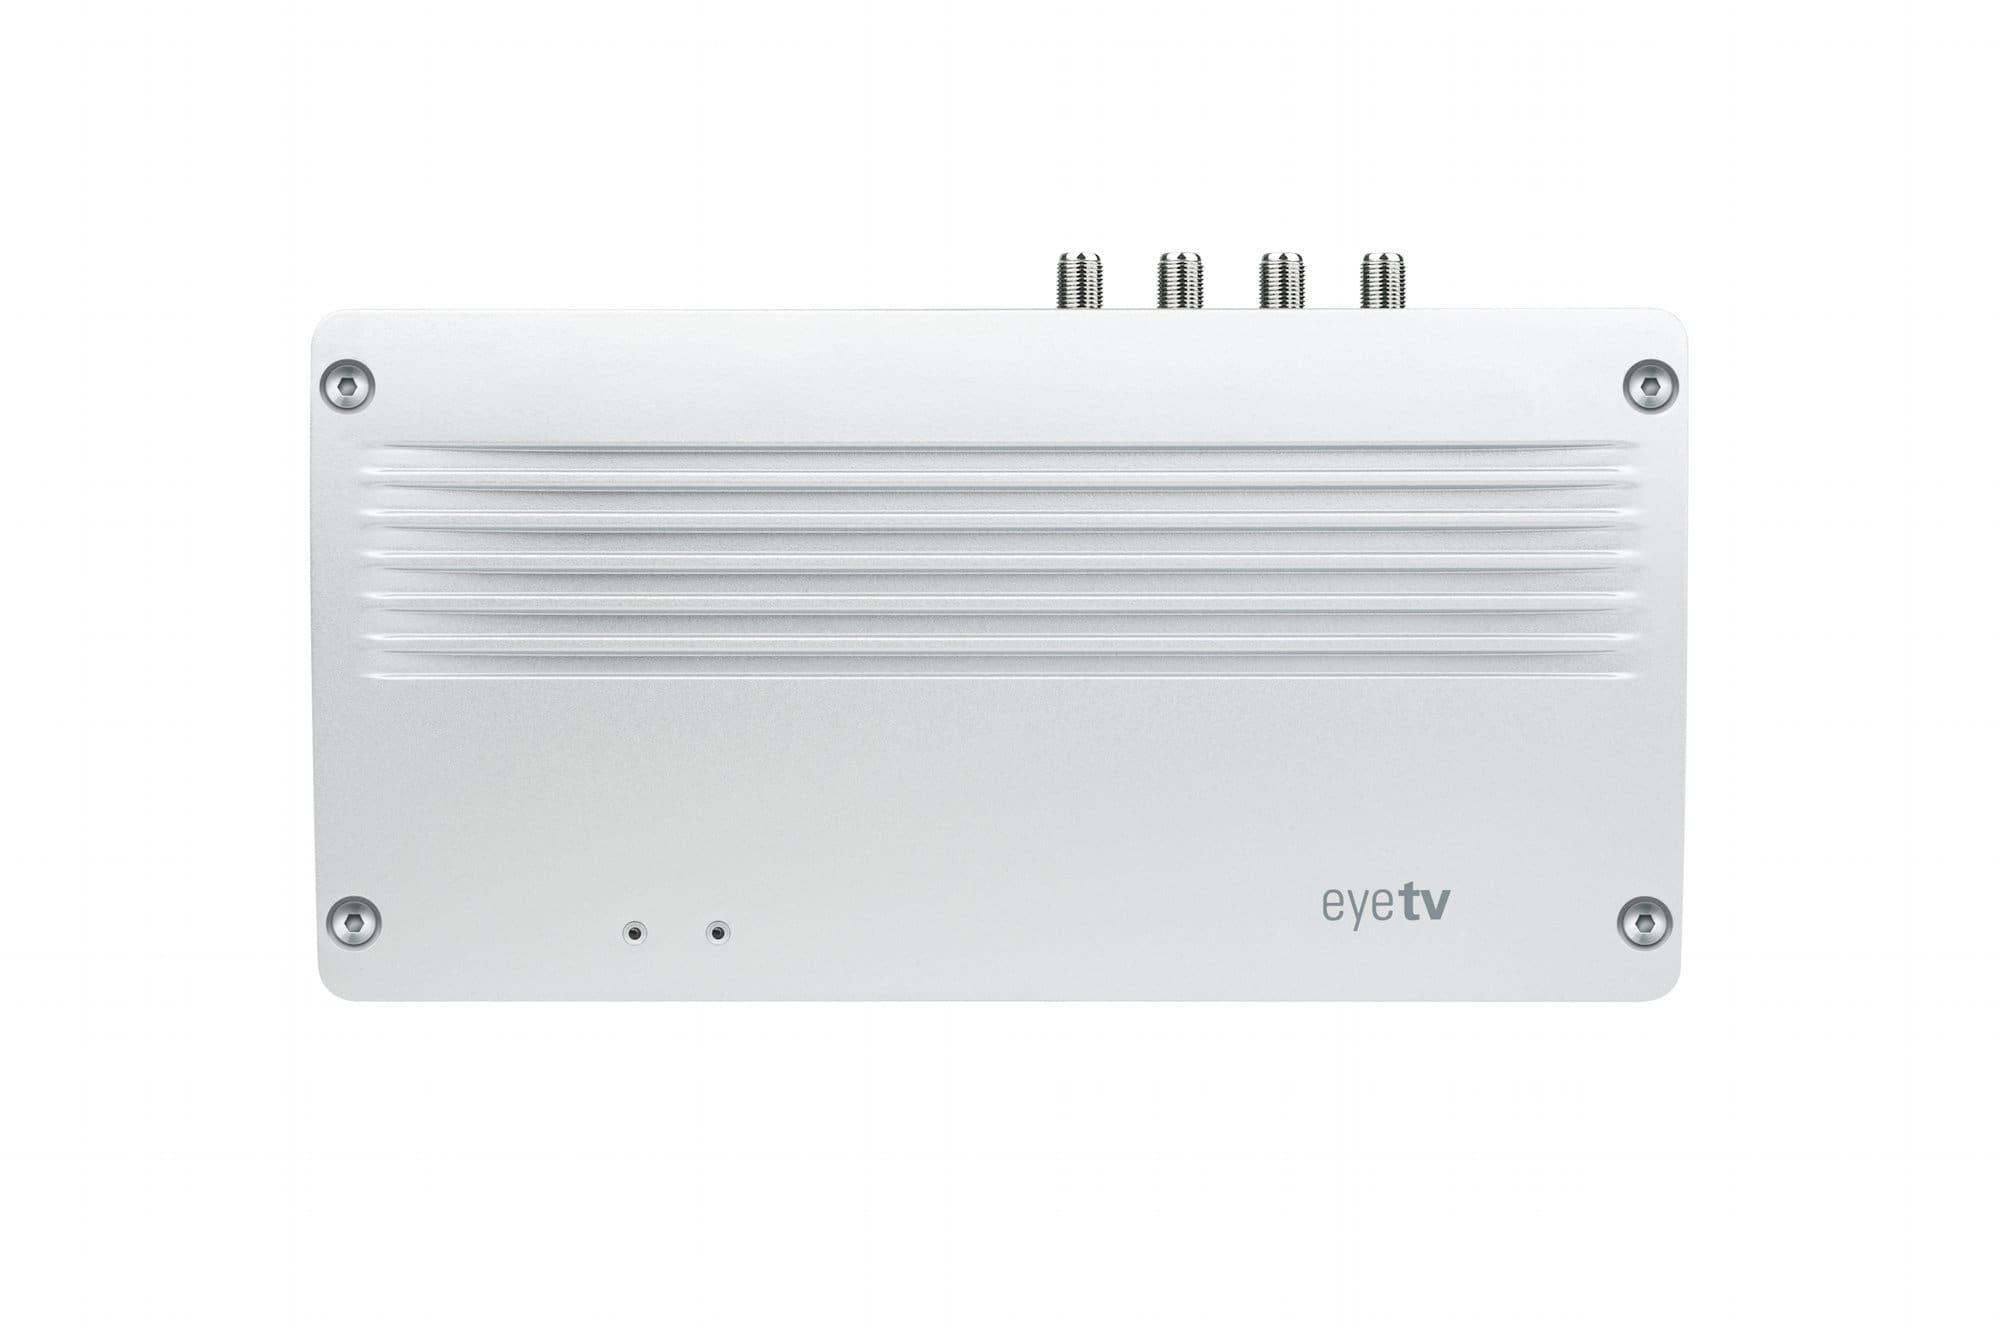 Elgato Eye TV Netstream 4Sat für 299,00 Euro